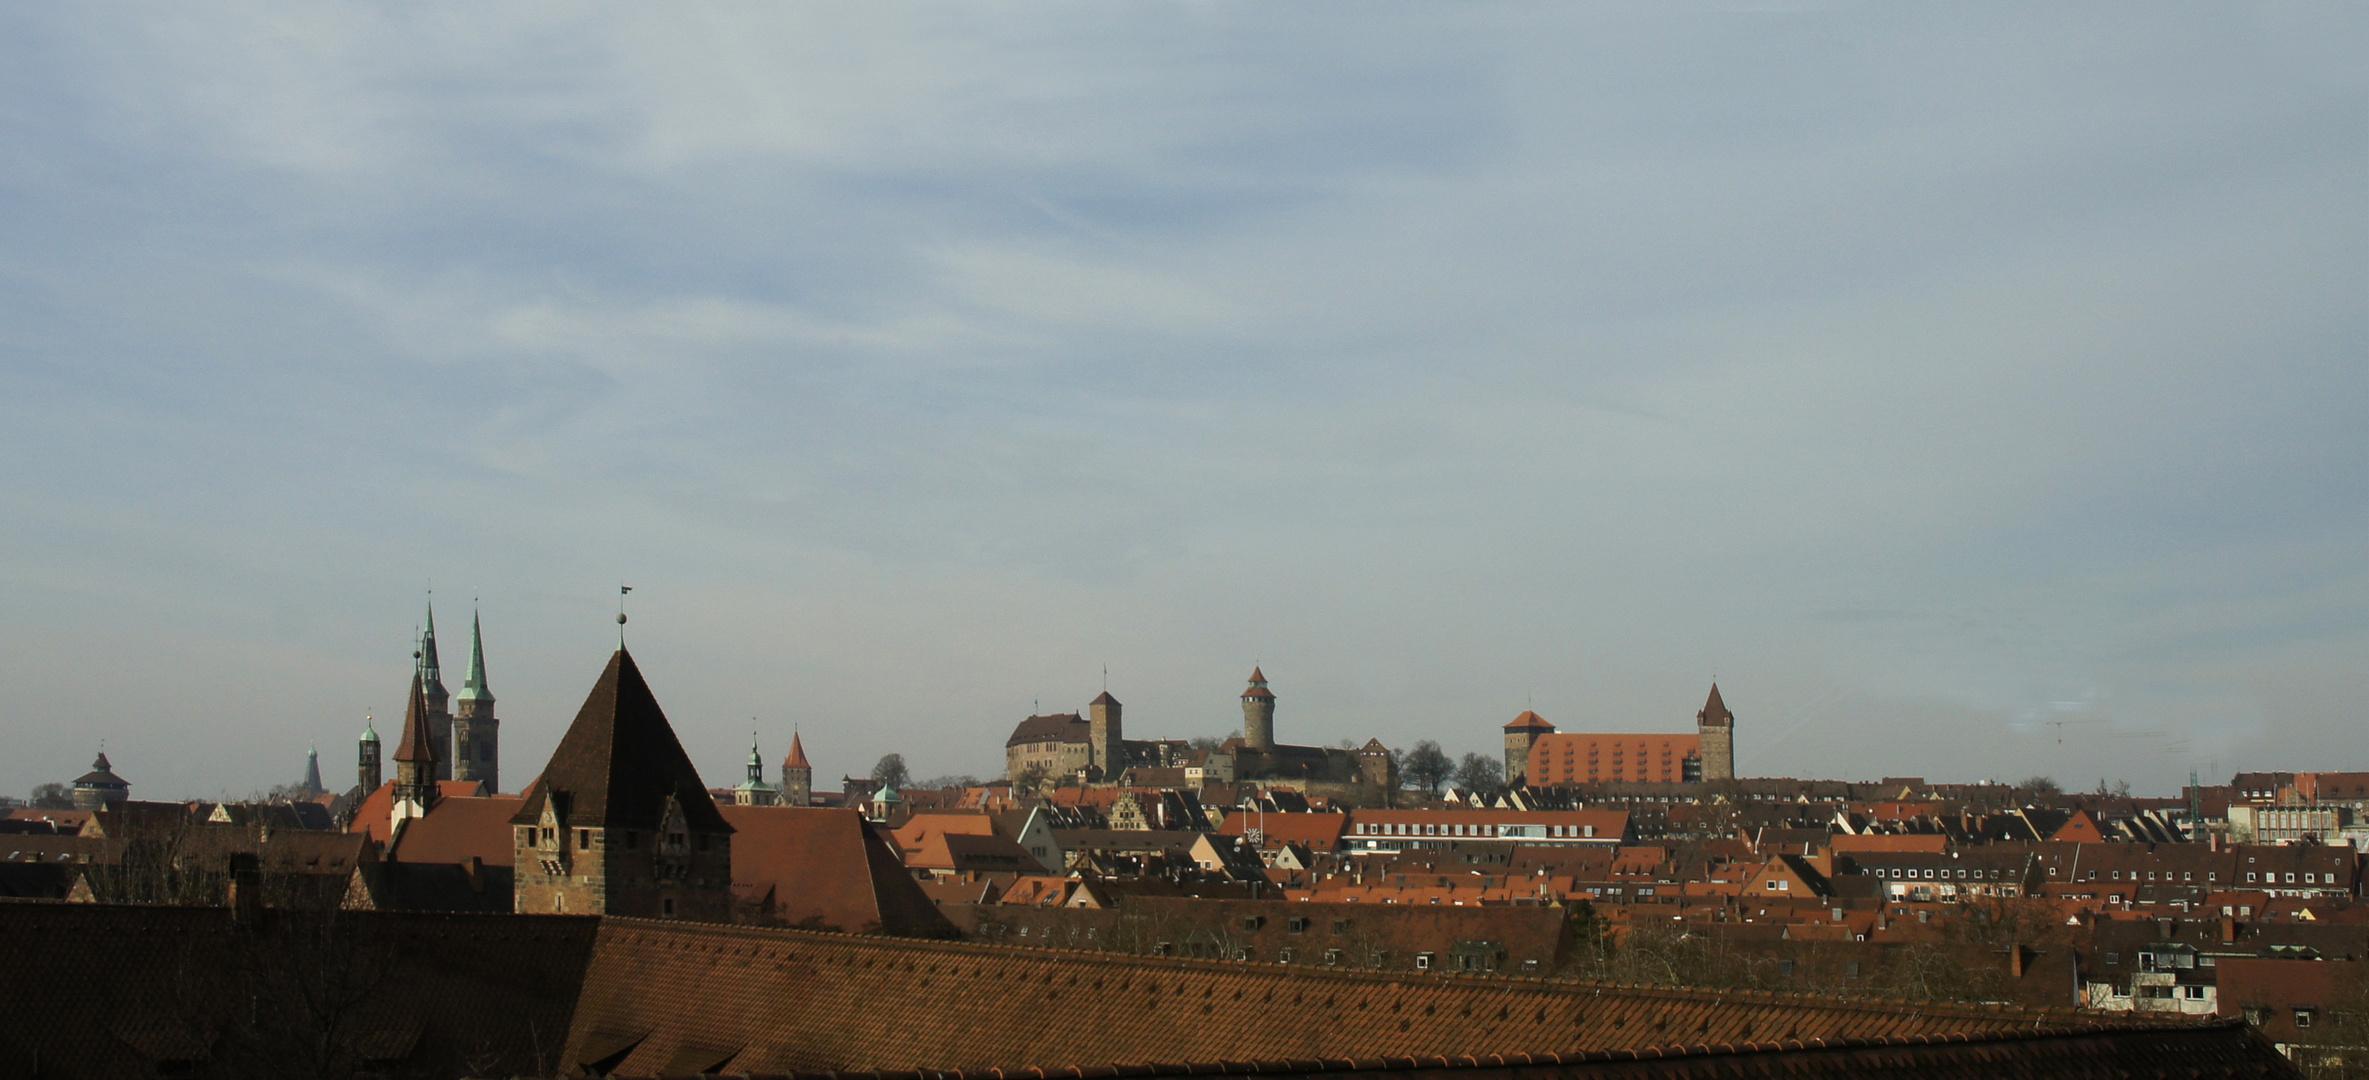 Nürnbergs Burg über den Dächern der Stadt...